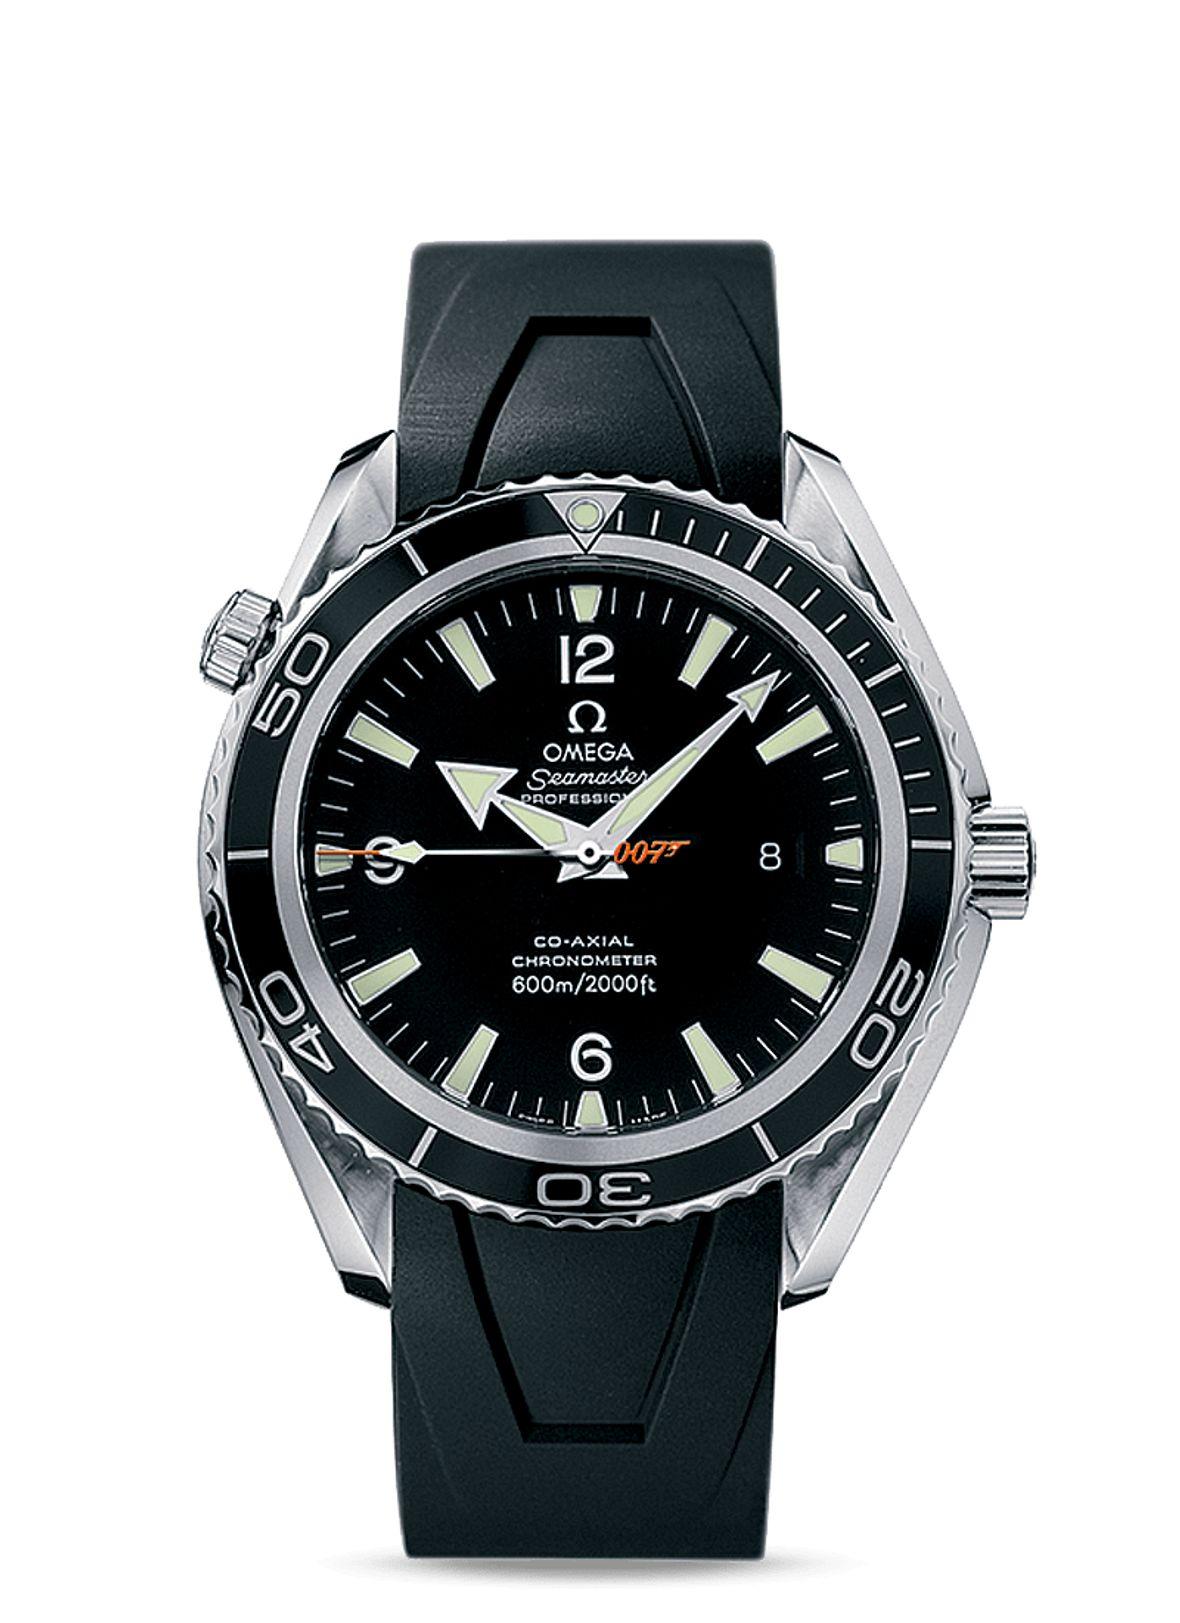 James Bond Omega Seamaster Planet Ocean 600M Big Size 007 Edition